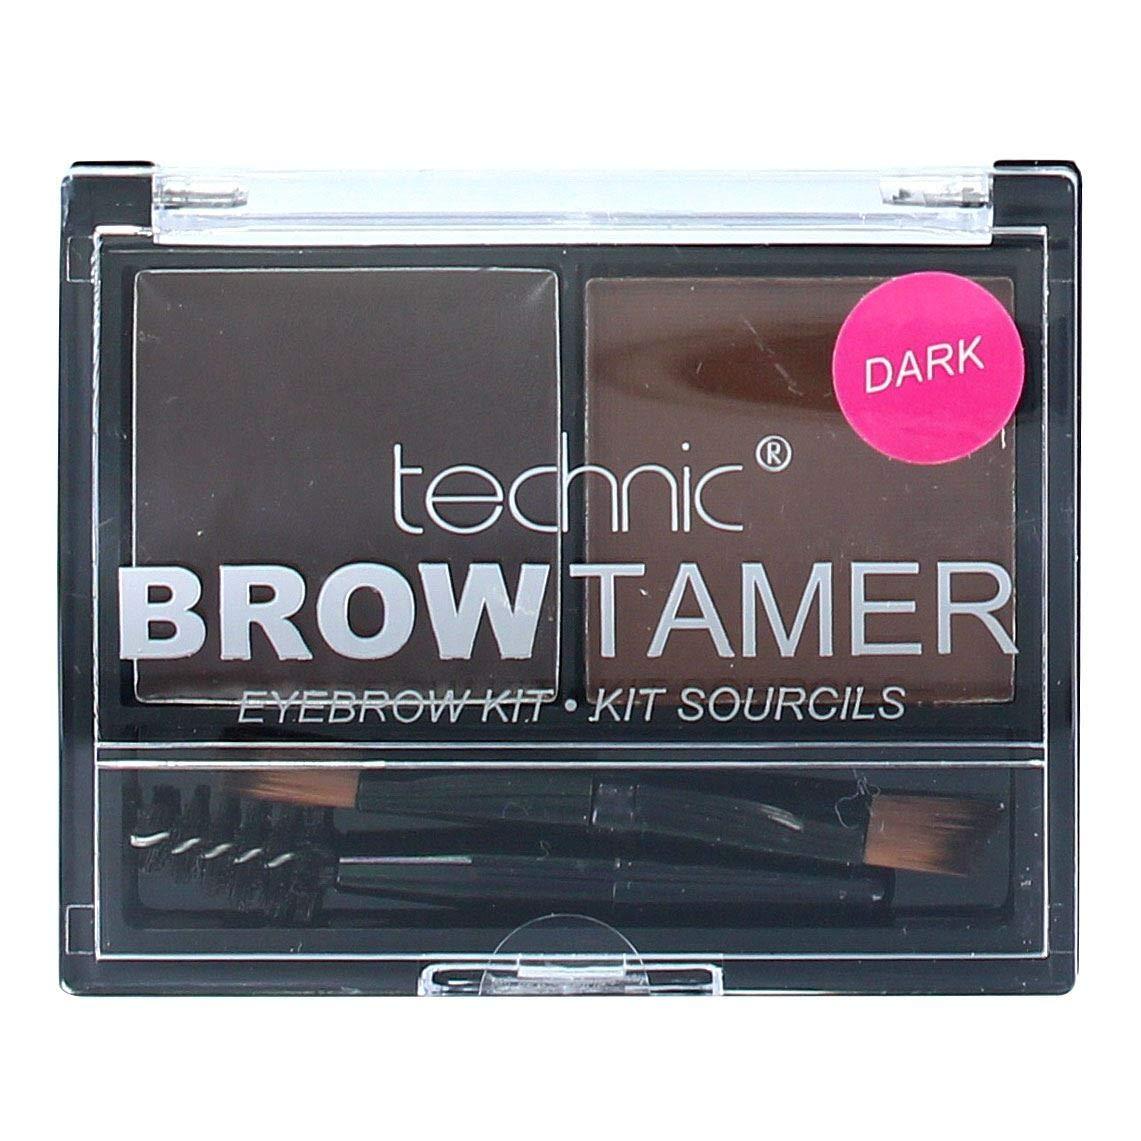 Technic Brow Tamer Eyebrow Shaping Kit-Dark by Technic